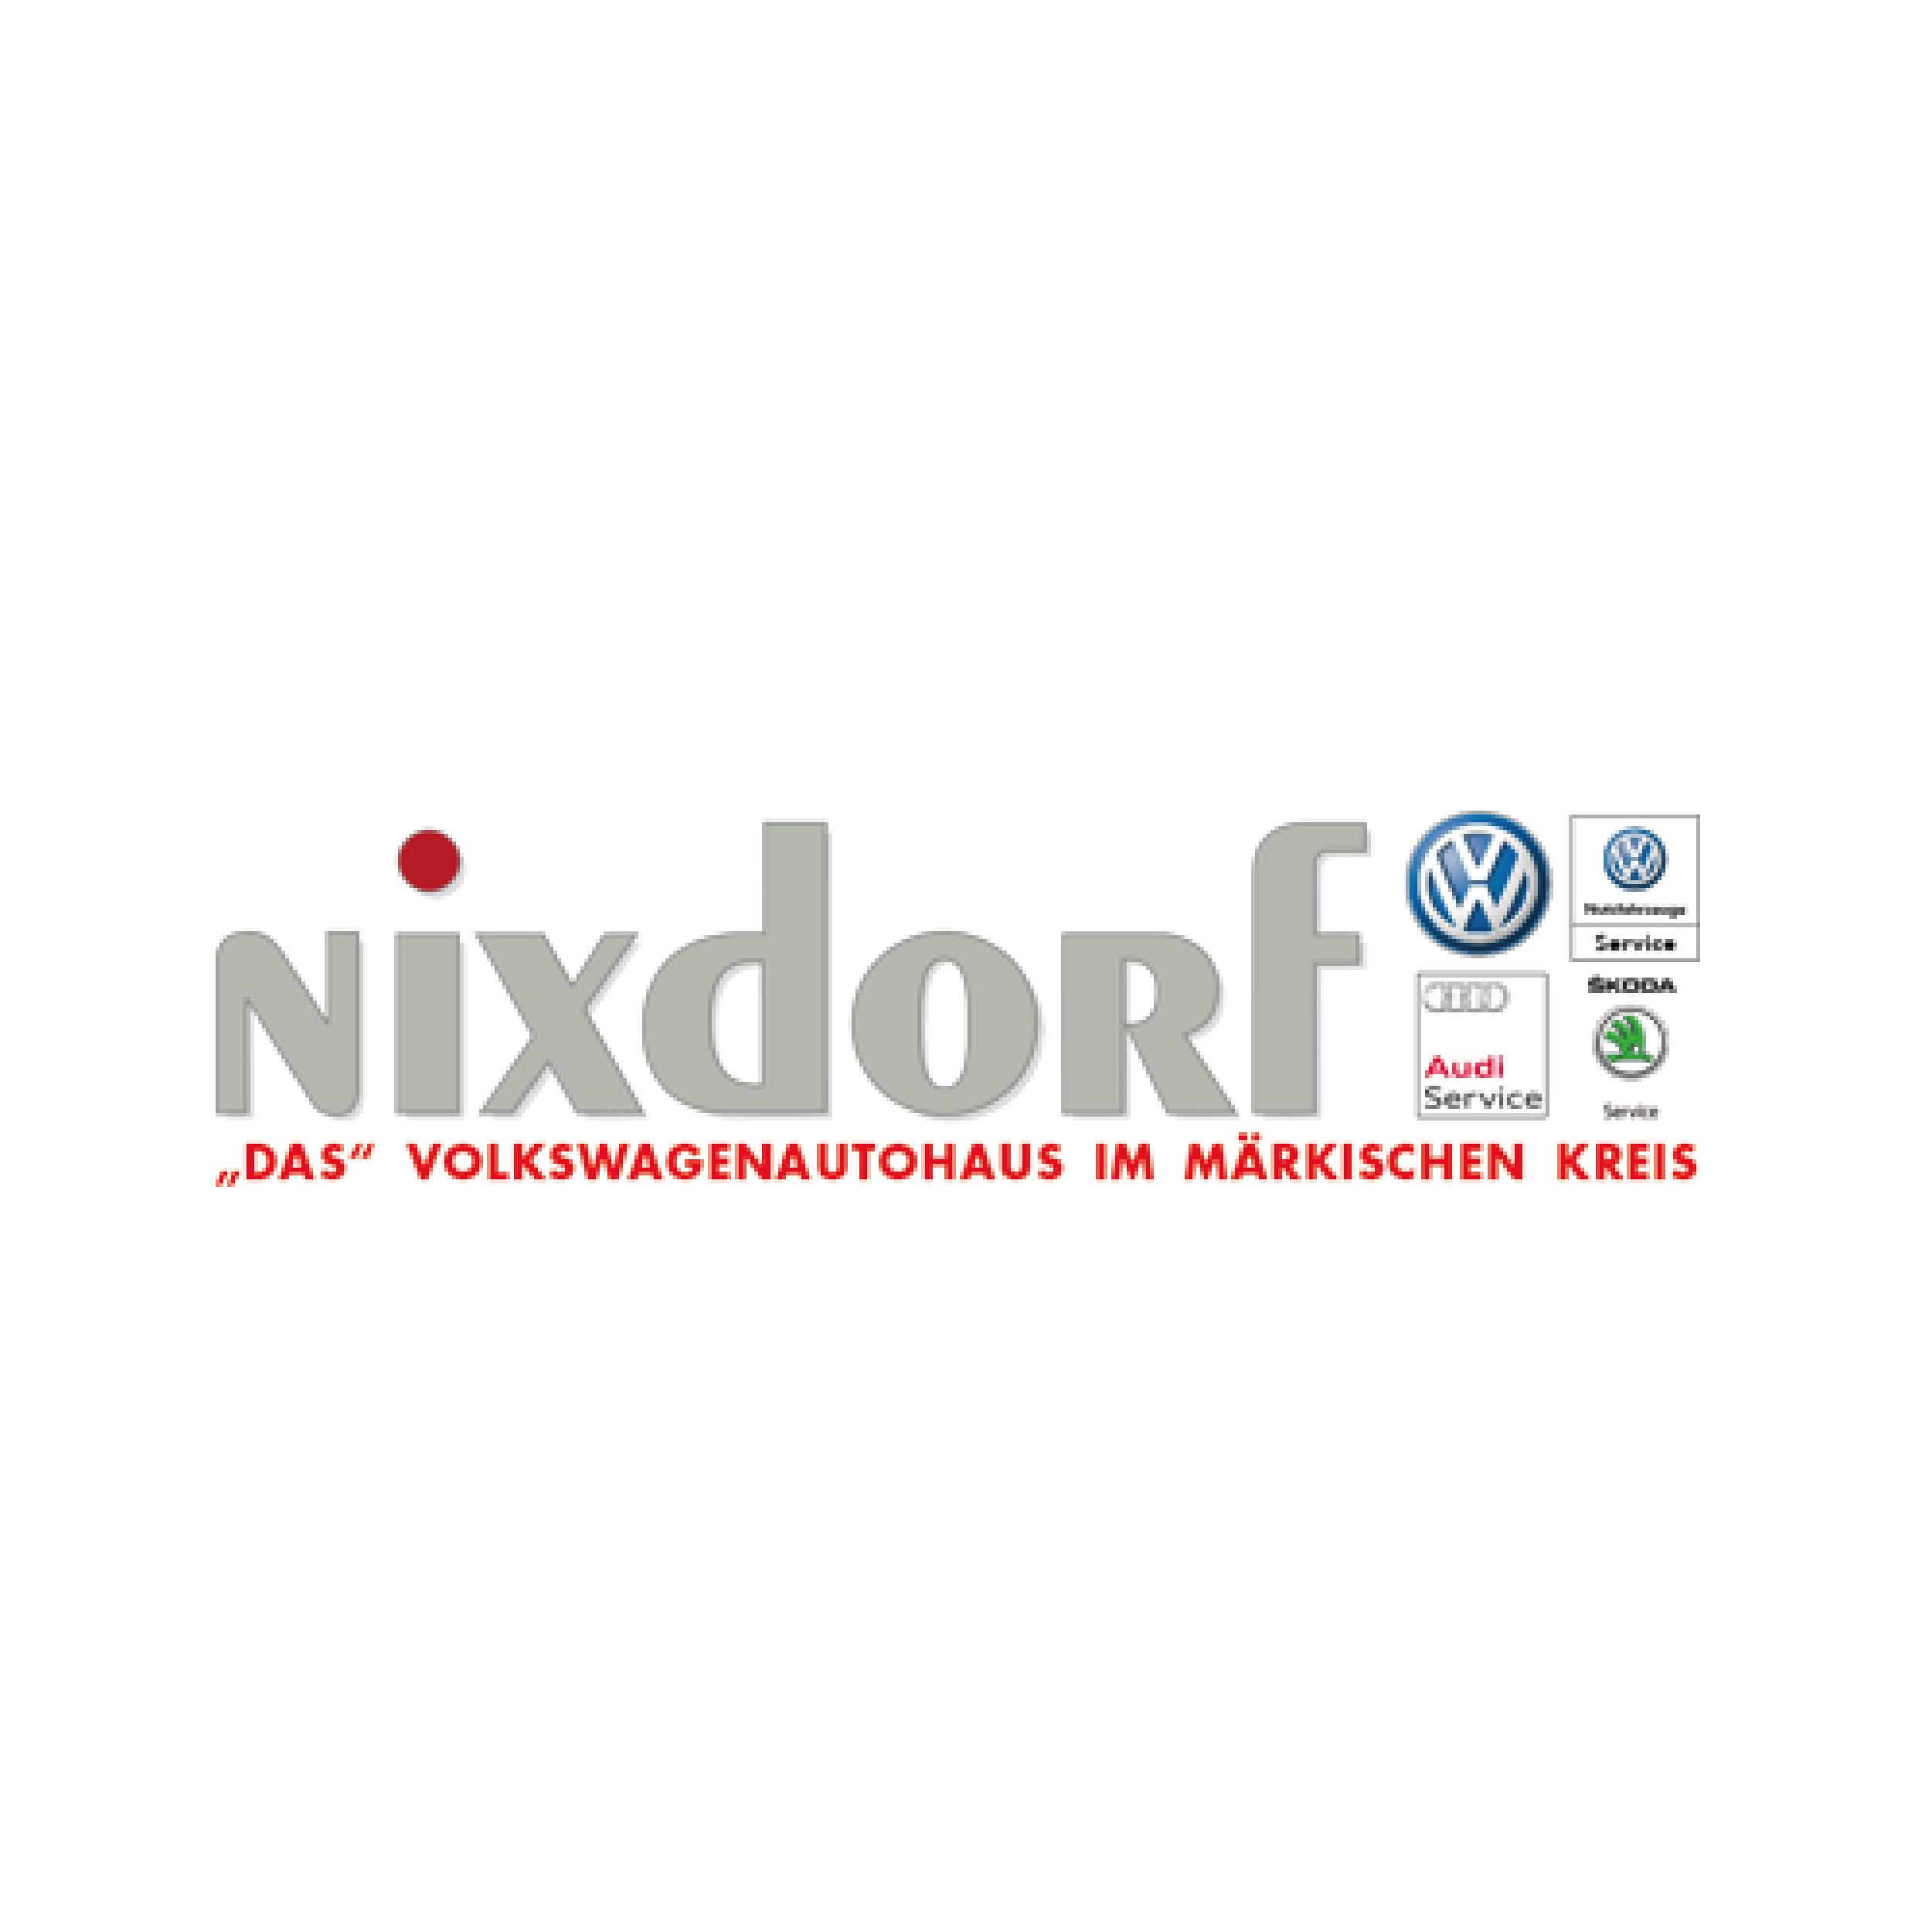 Nixdorf-01